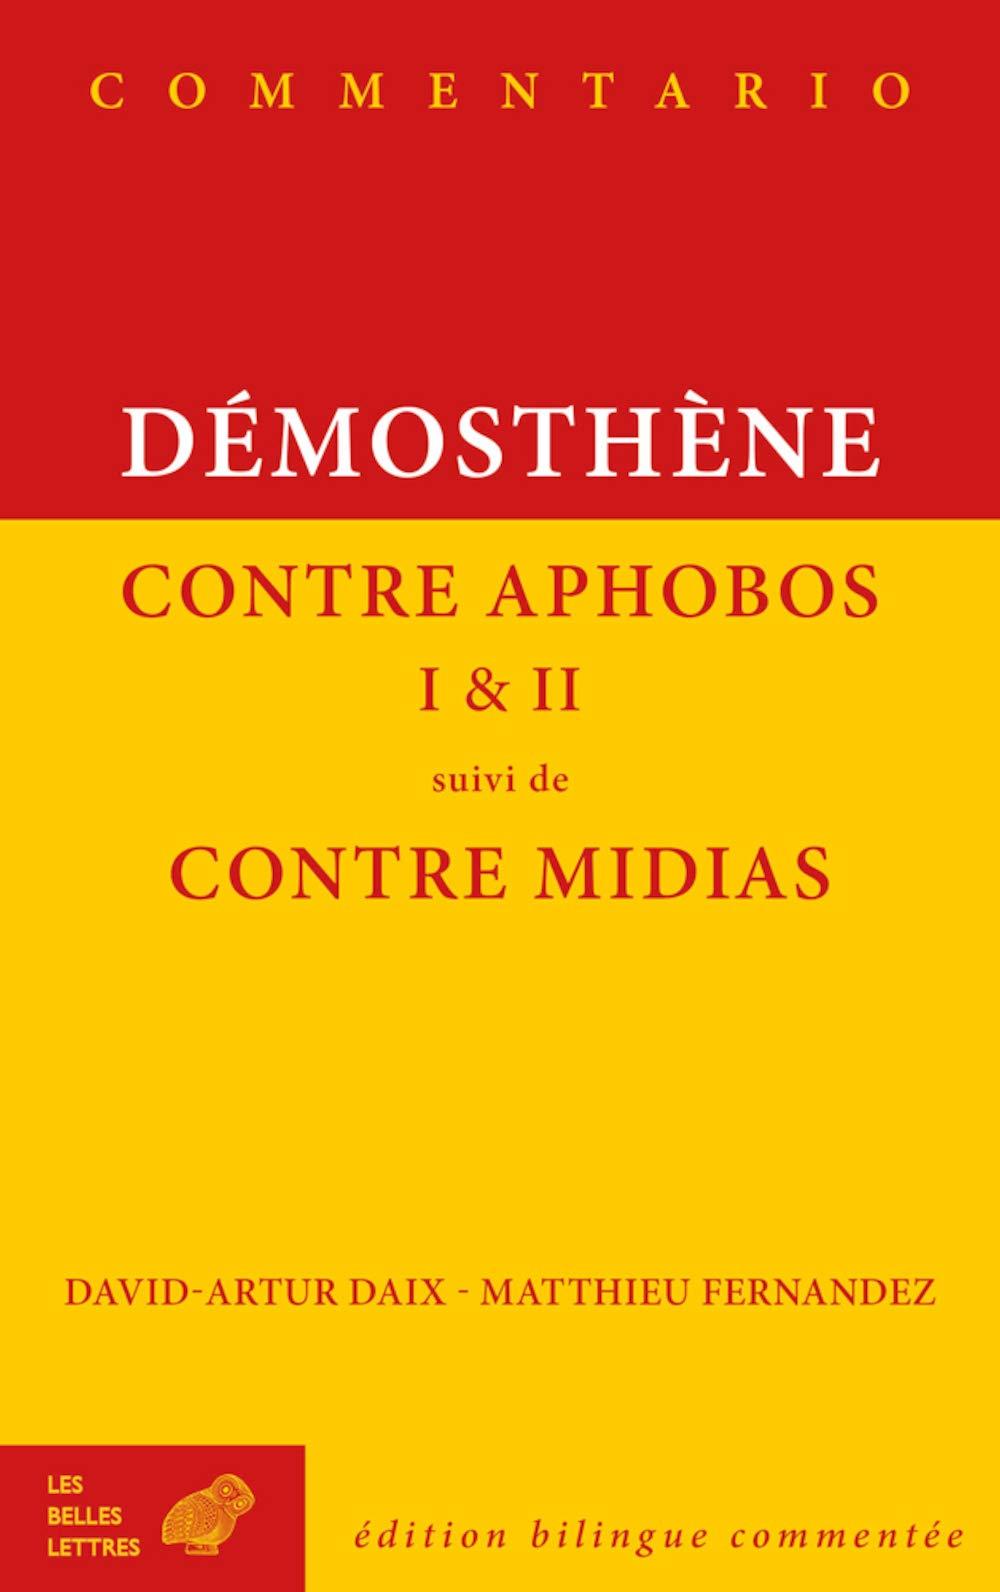 Amazon Com Demosthene Contre Aphobos I Et Ii Suivi De Contre Midias Commentario French Edition 9782251447162 Daix David Arthur Fernandez Matthieu Books